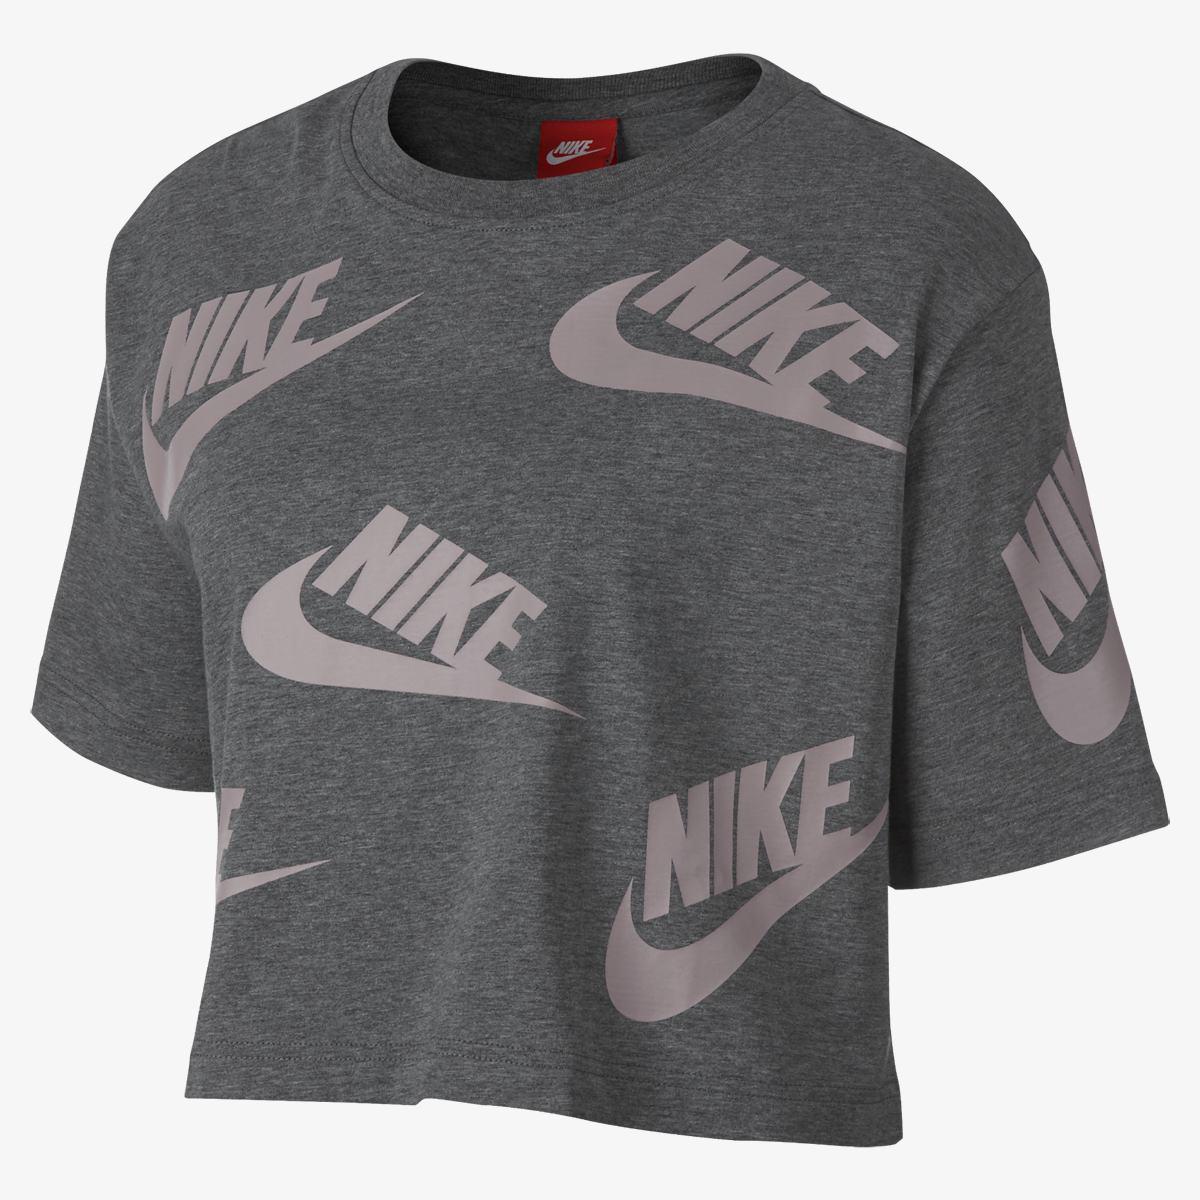 half off 3ded2 e0079 Женская футболка NIKE NSW Top Futura Toss (Артикул  928688-092)